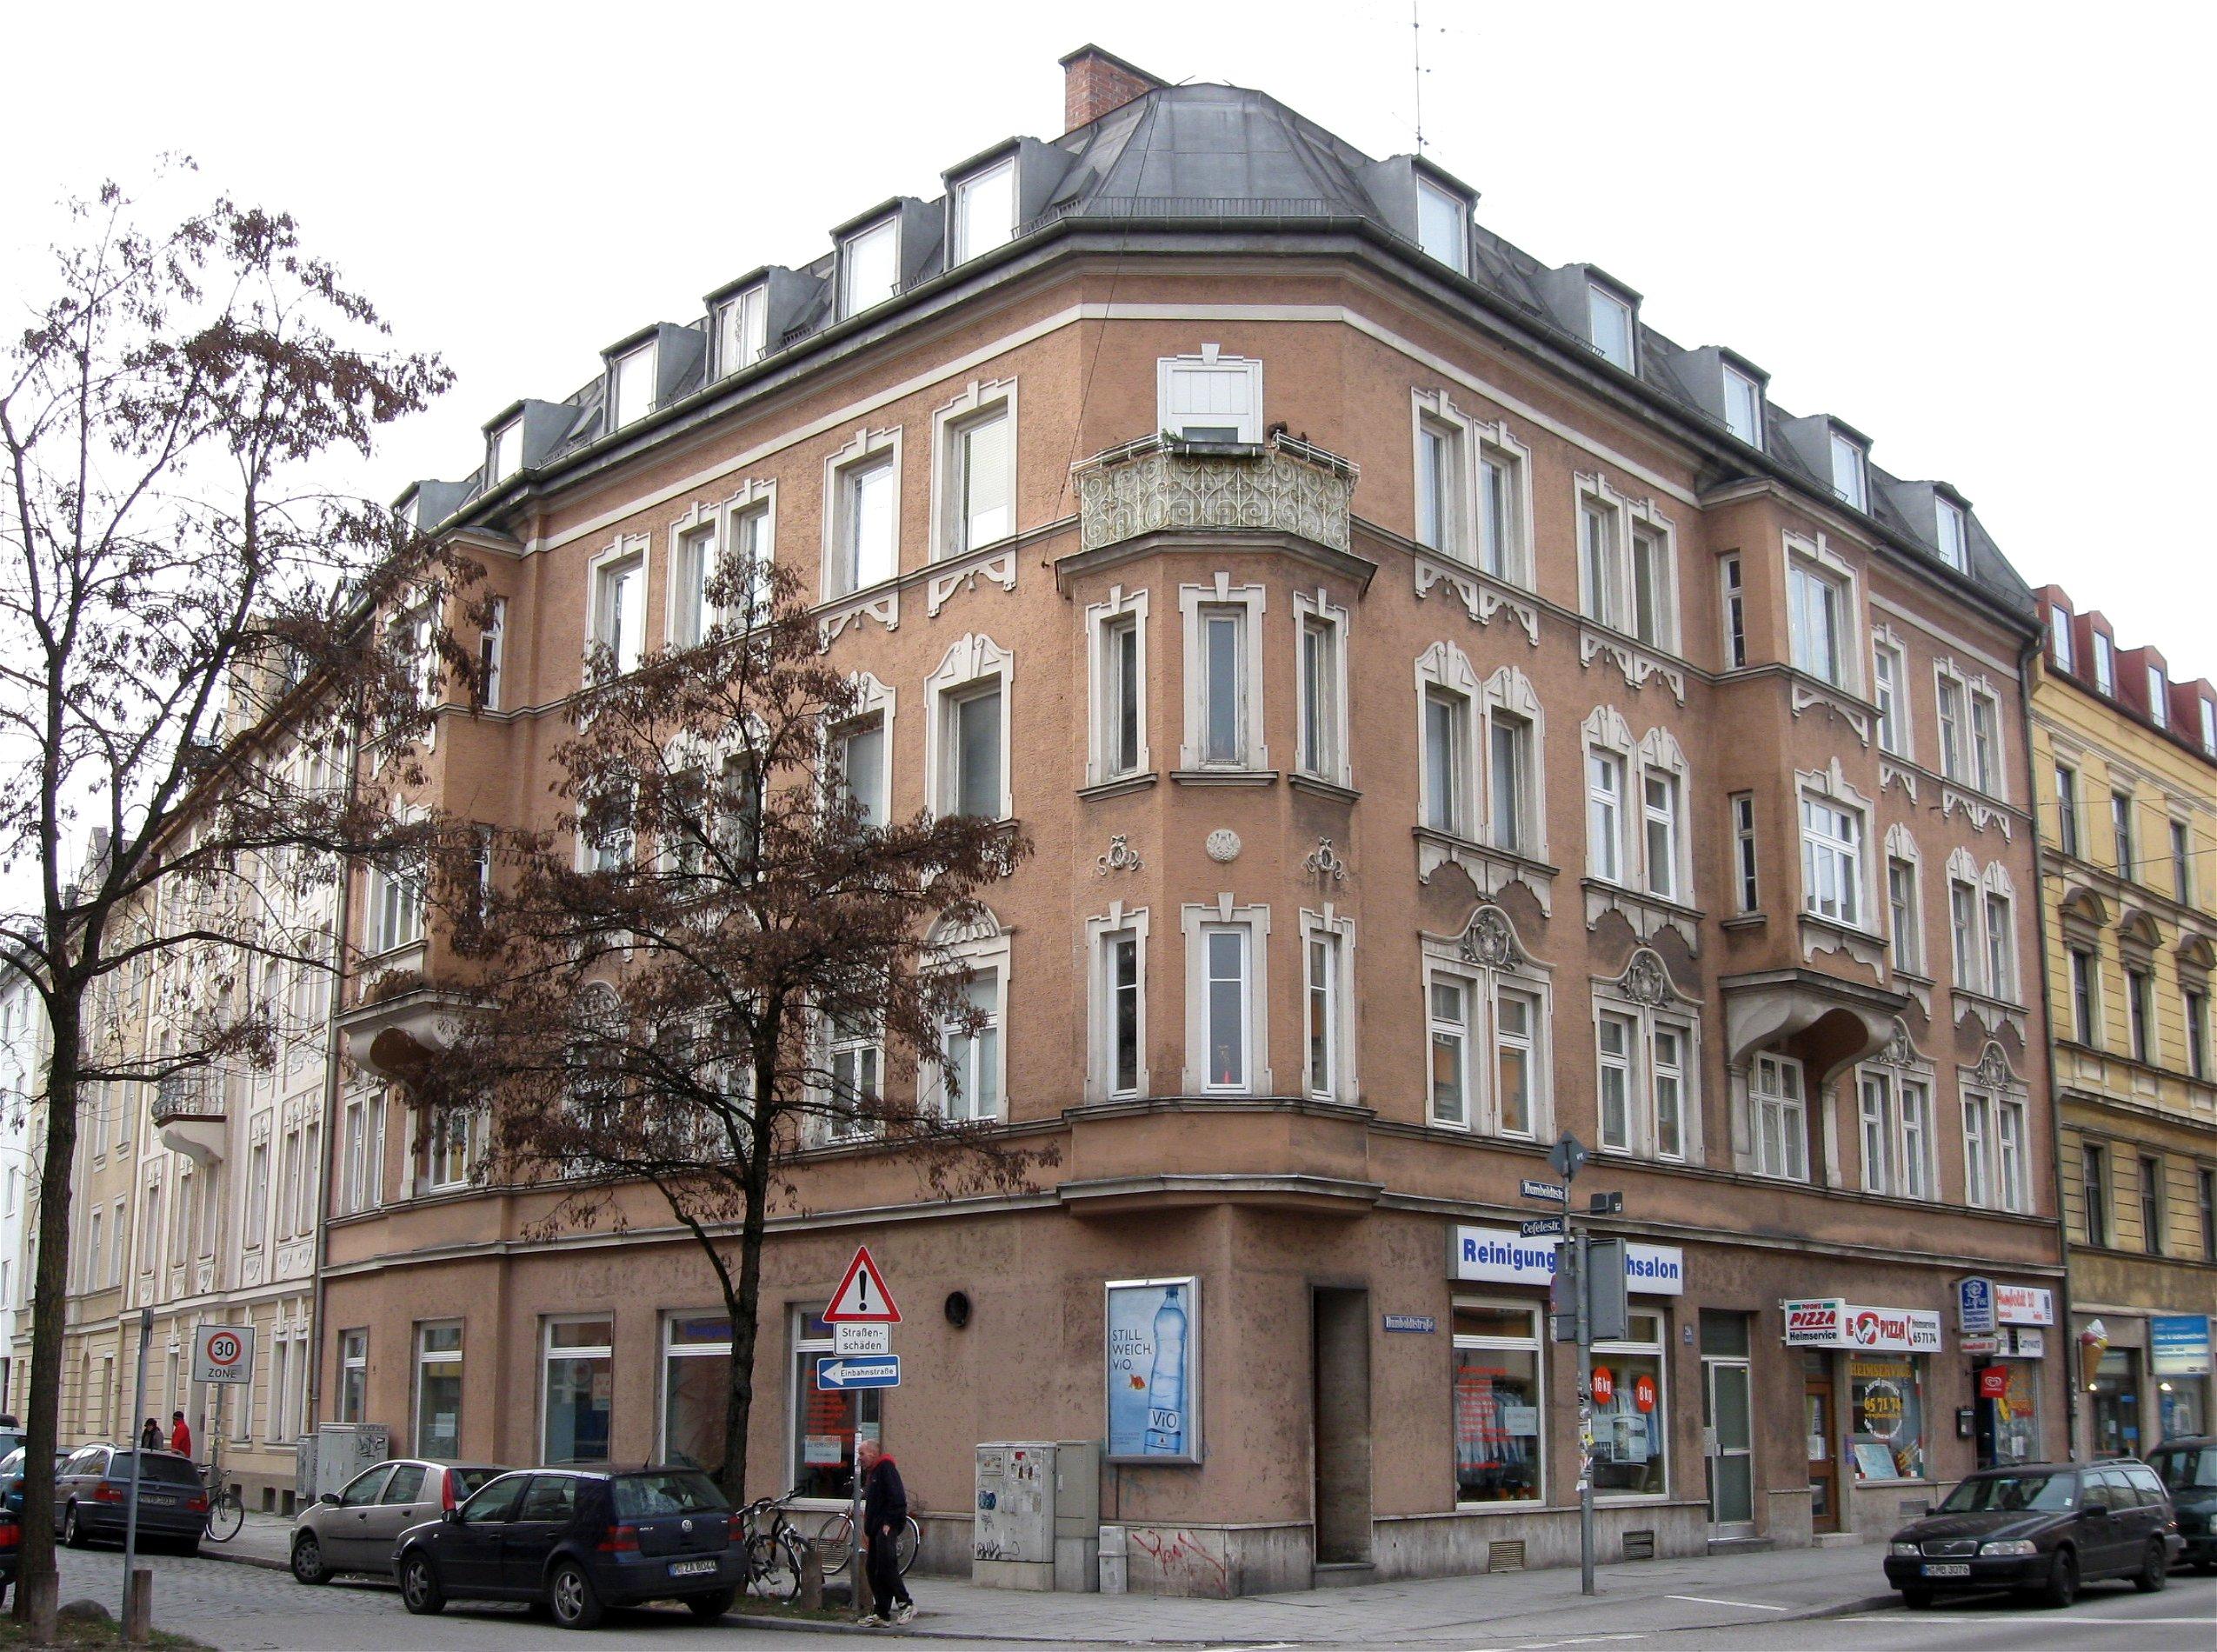 Humboldtstr München file humboldtstr 20 muenchen 1 jpg wikimedia commons